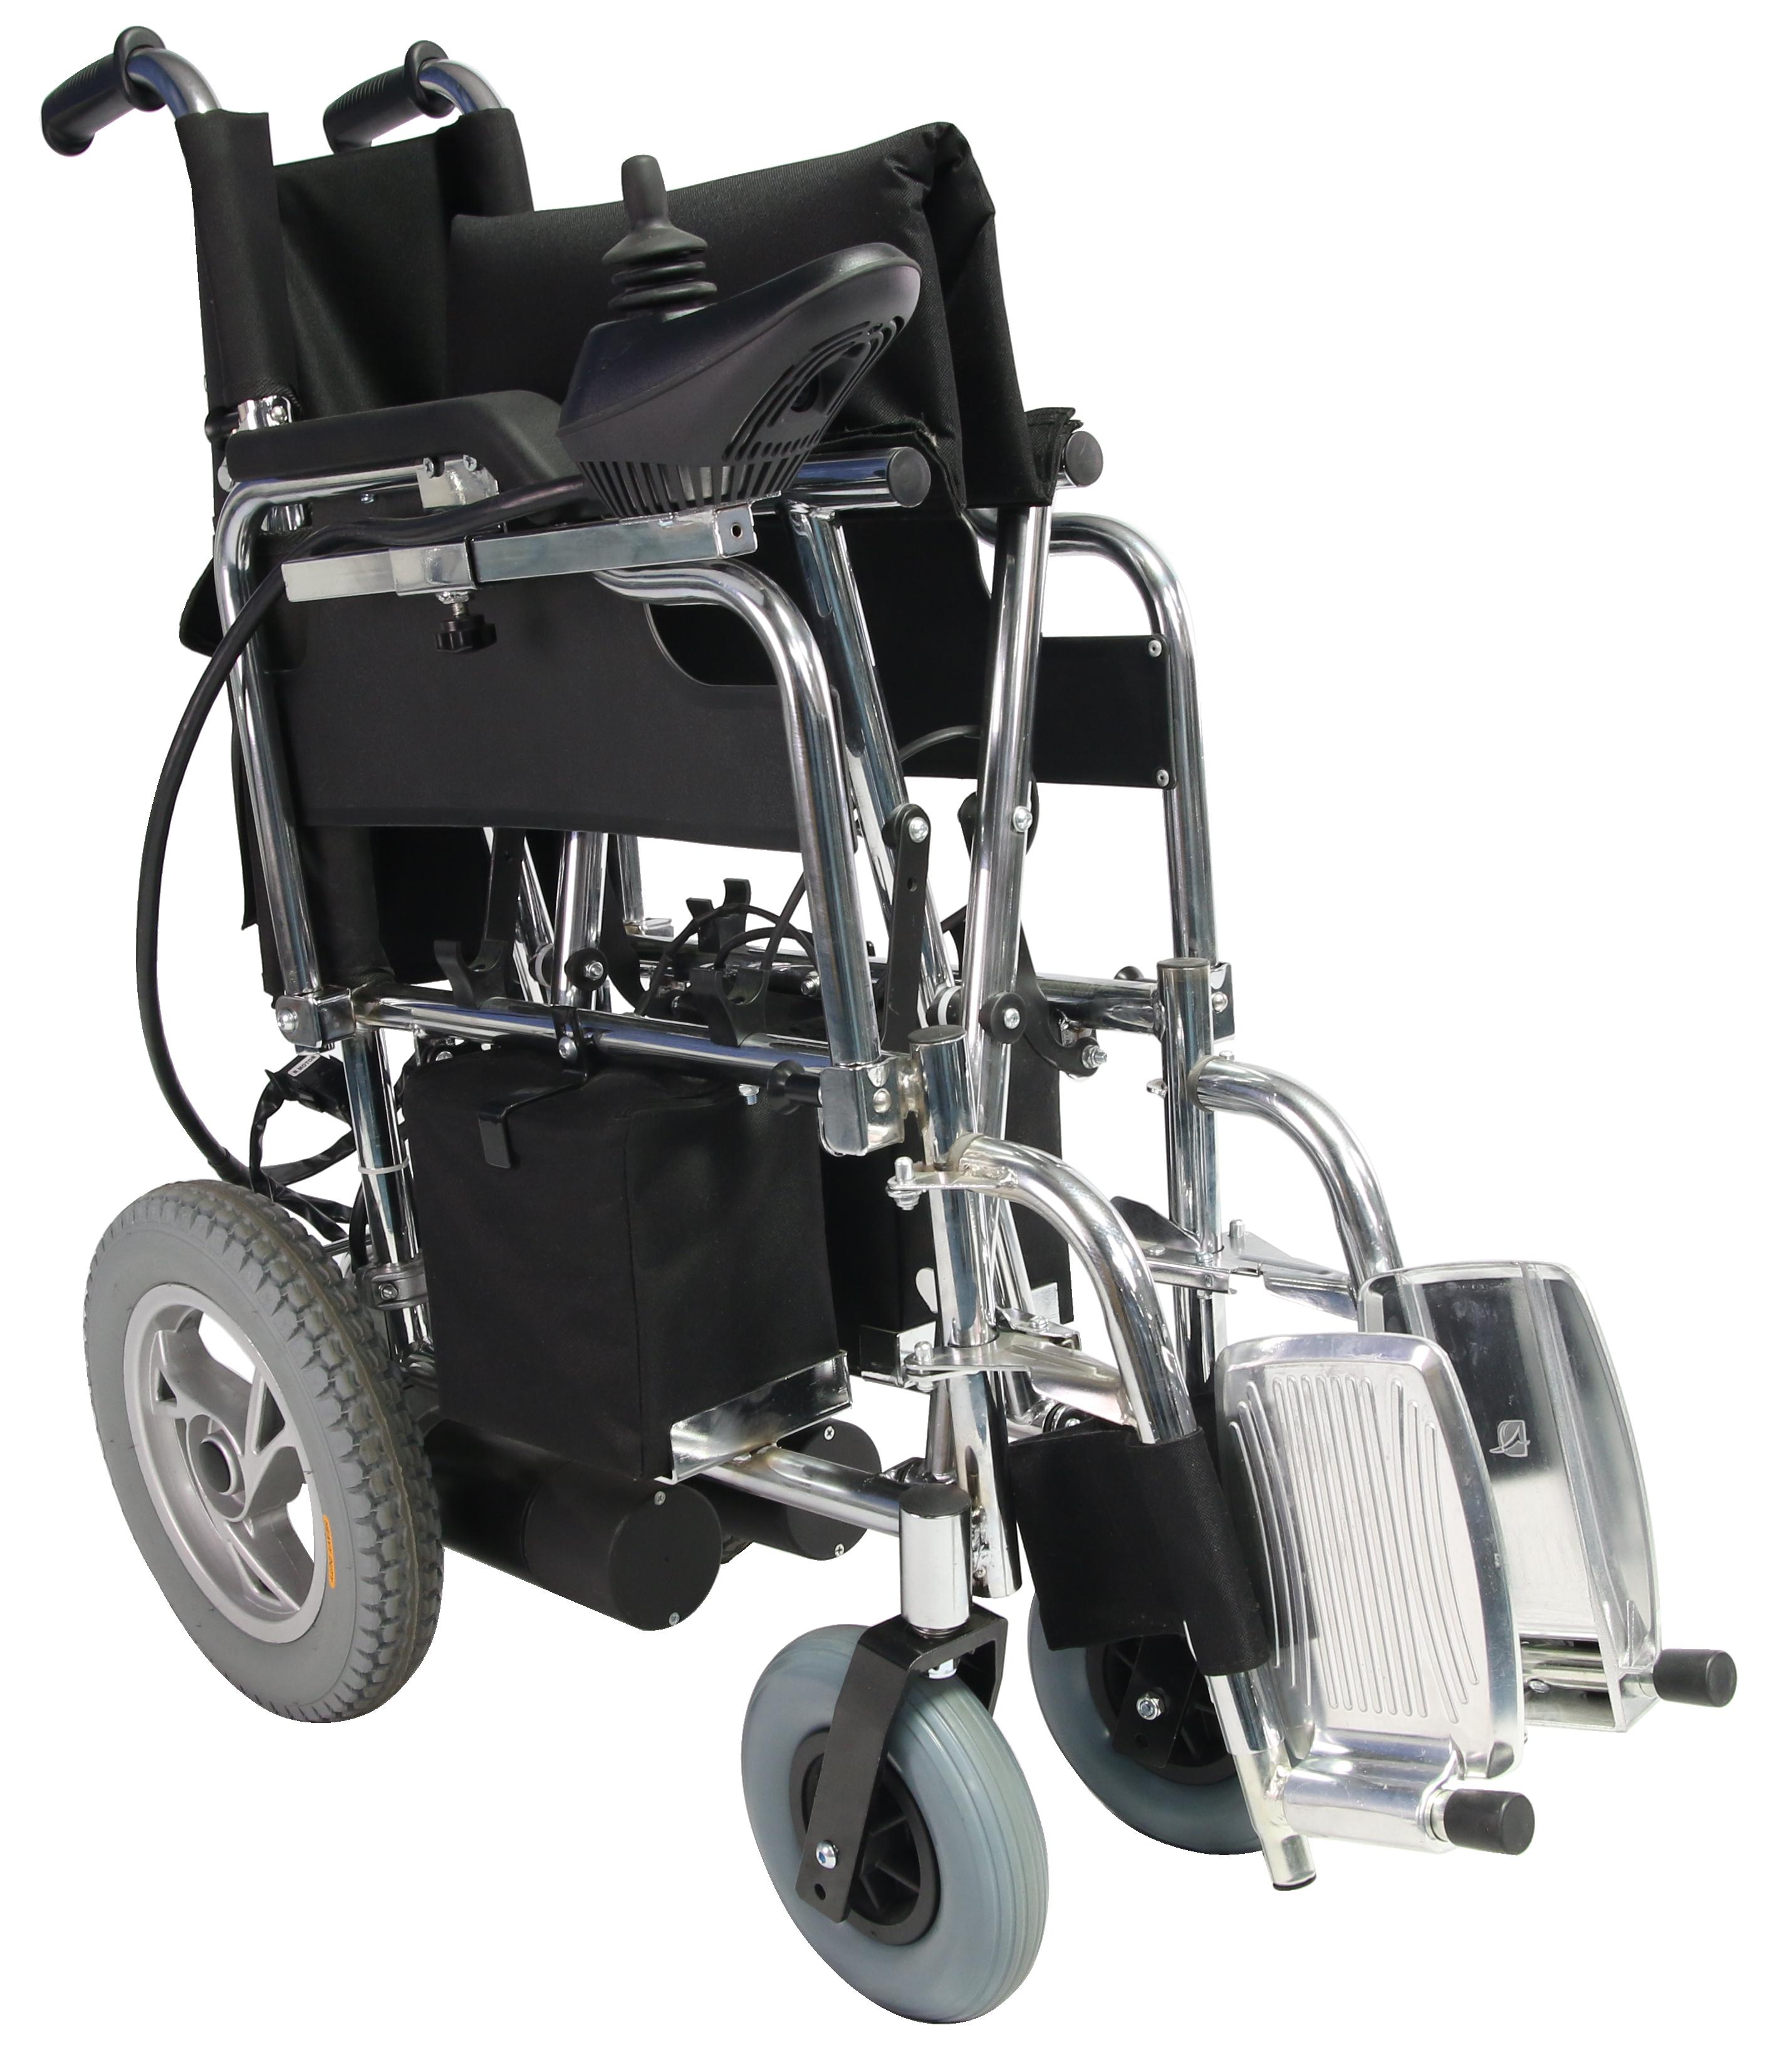 Medical All Terrain Power Wheelchair For Disabled Manufacturers, Medical All Terrain Power Wheelchair For Disabled Factory, Supply Medical All Terrain Power Wheelchair For Disabled